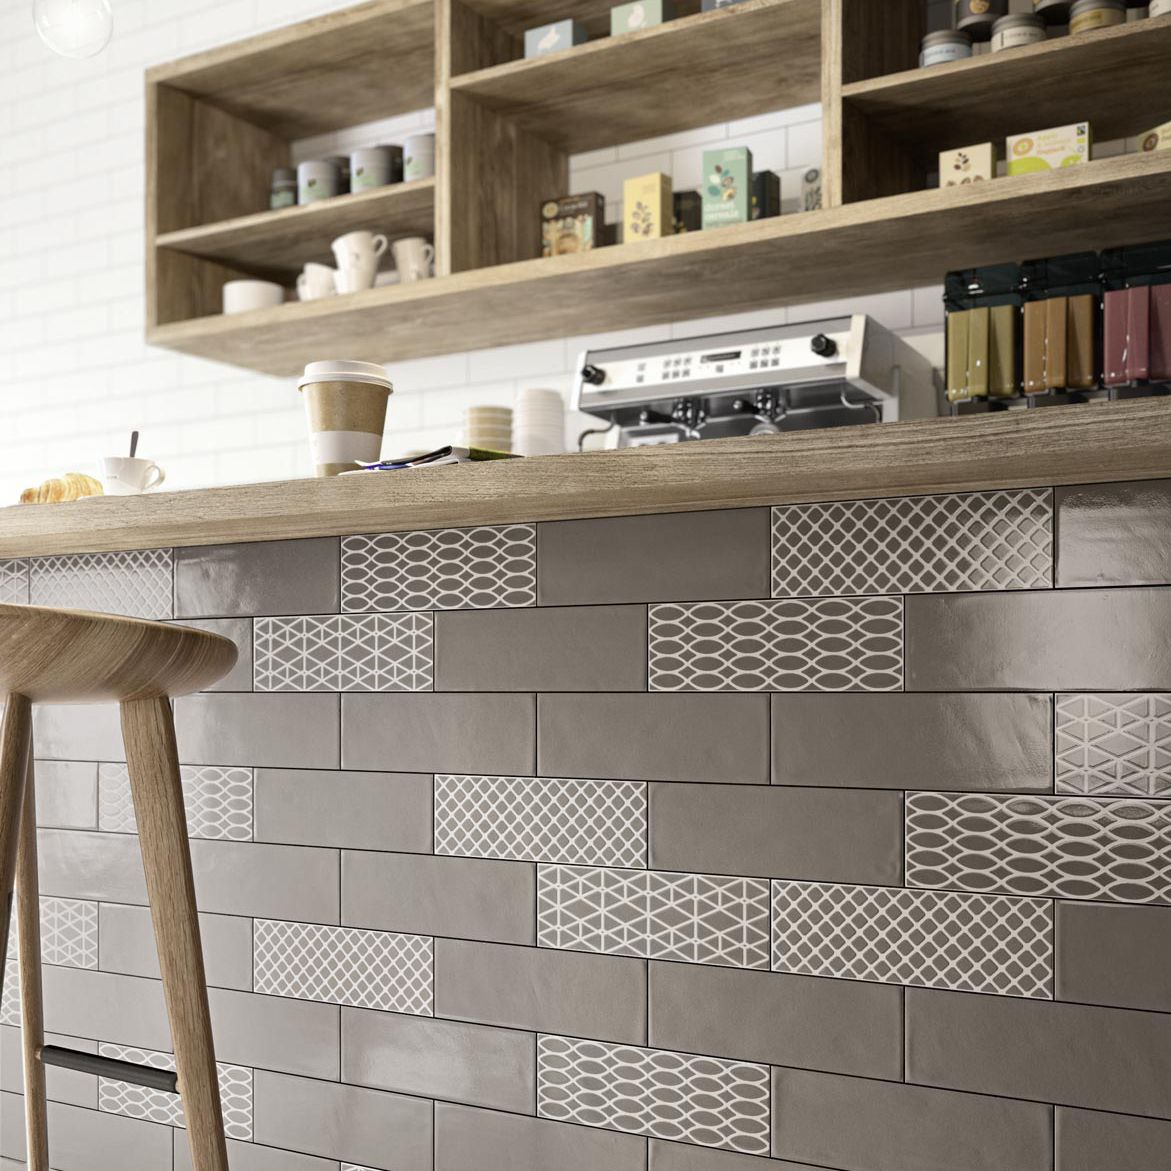 Bathroom Tile Kitchen Wall Ceramic Brick Glossy Ragno